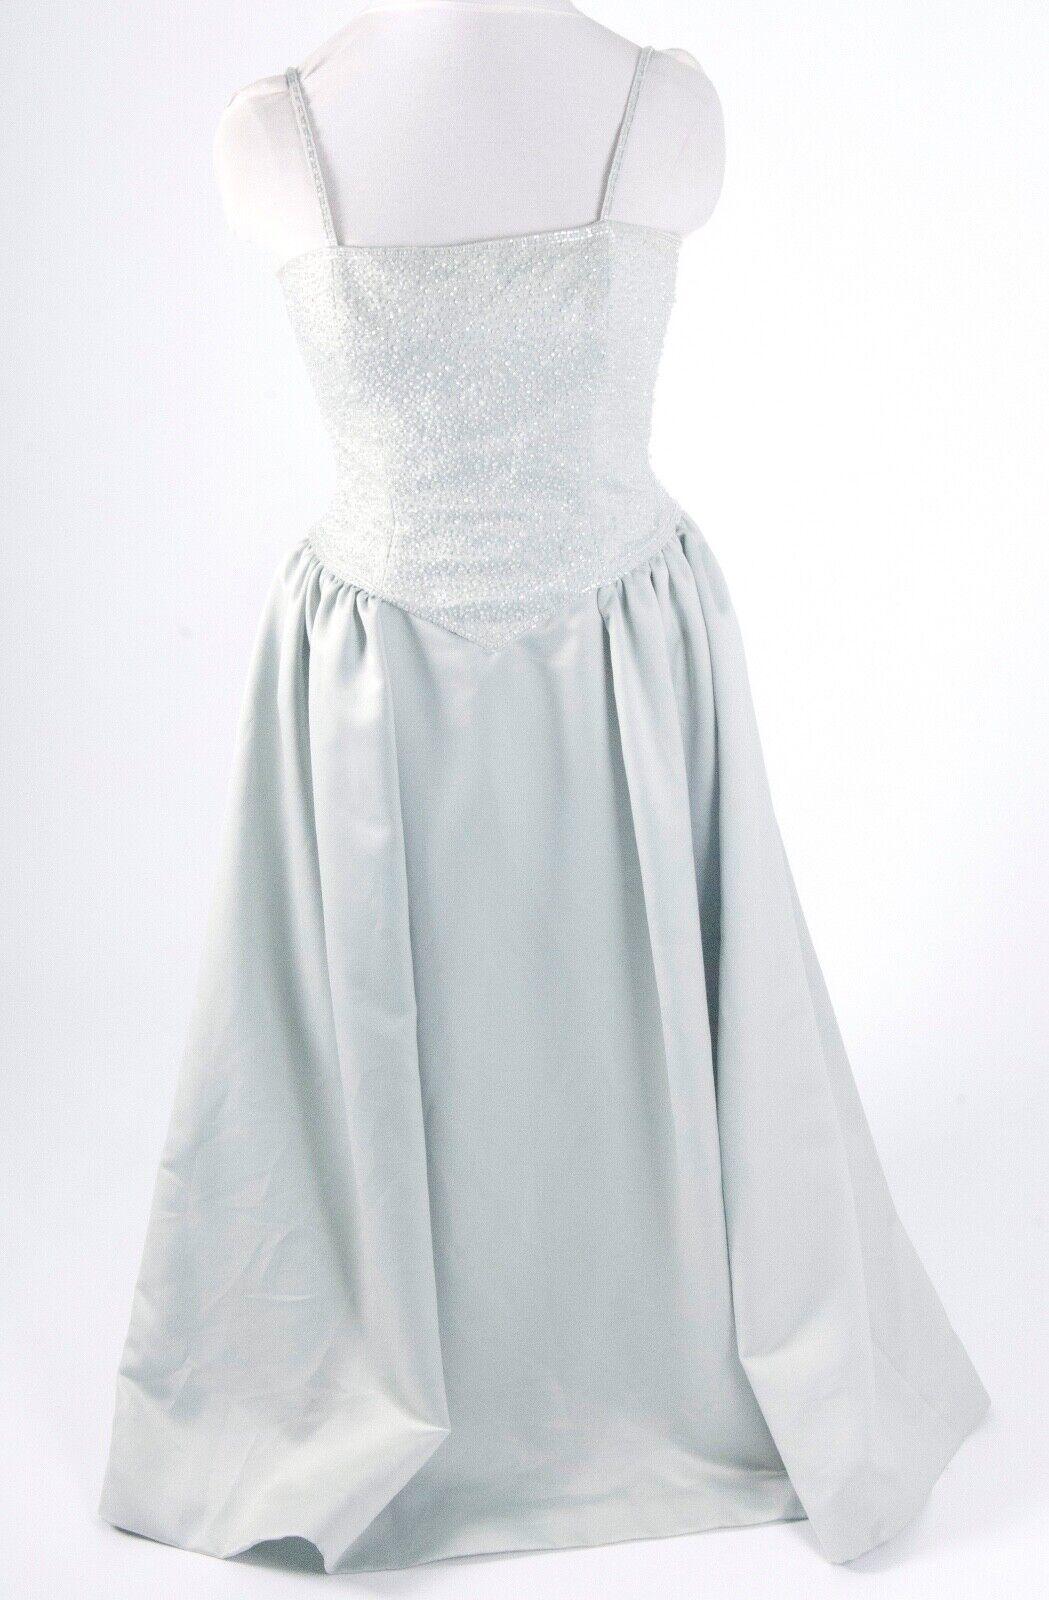 Green Gray Satin EveningBall Gown Formal Dress sz 8 Oleg Cassani BlackTie BEADED